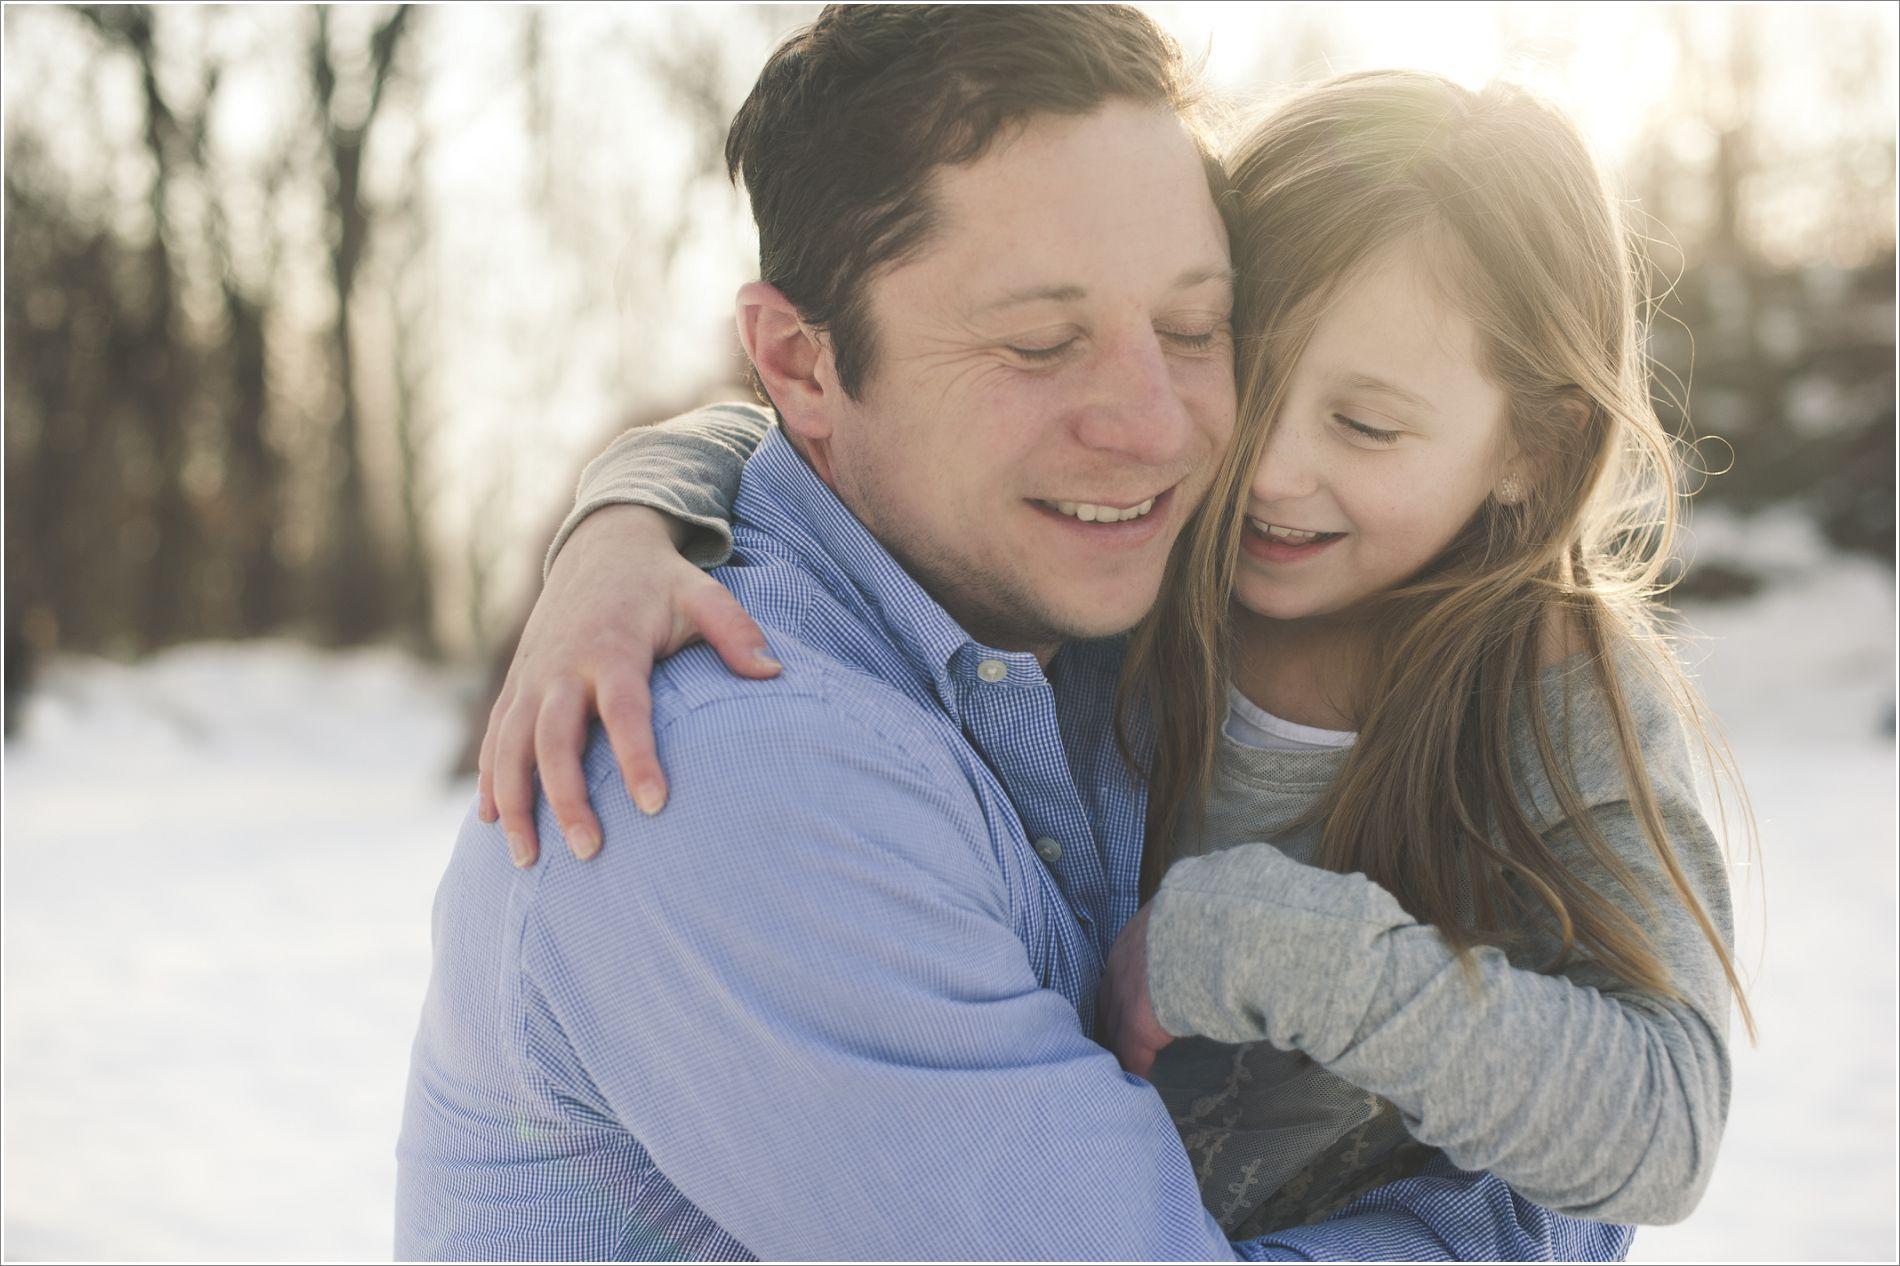 verva photography. family portraits